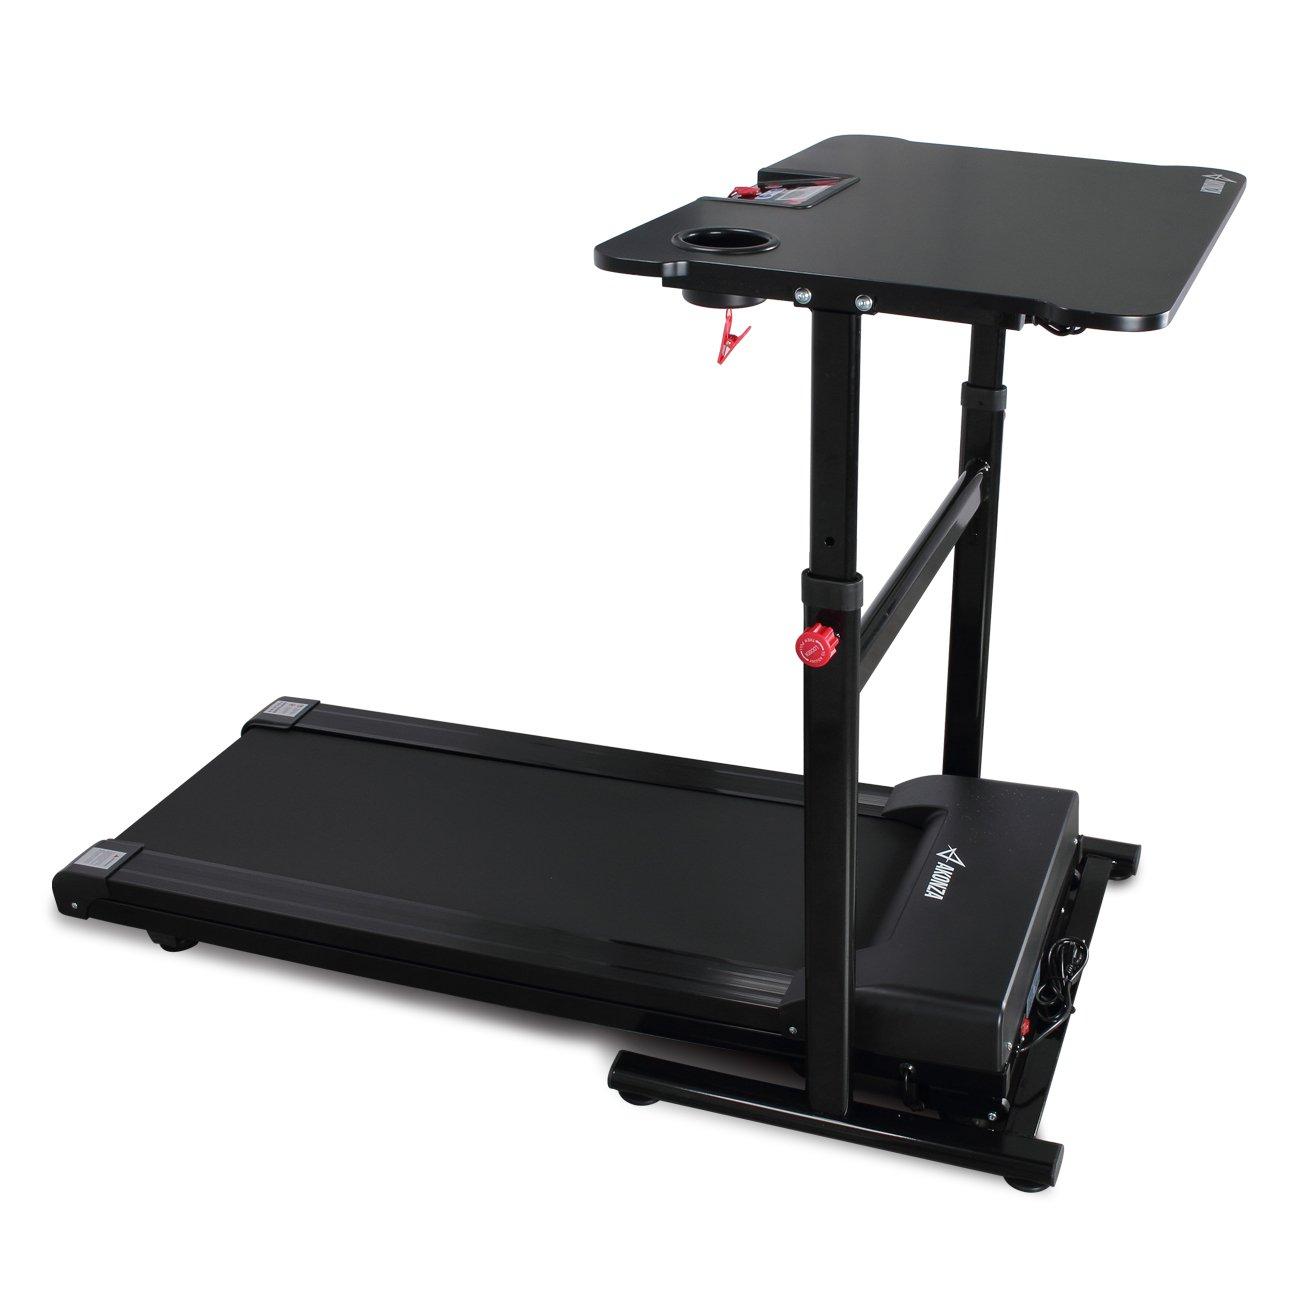 Akonza Electric Standing Walking Treadmill Desk Workstation W